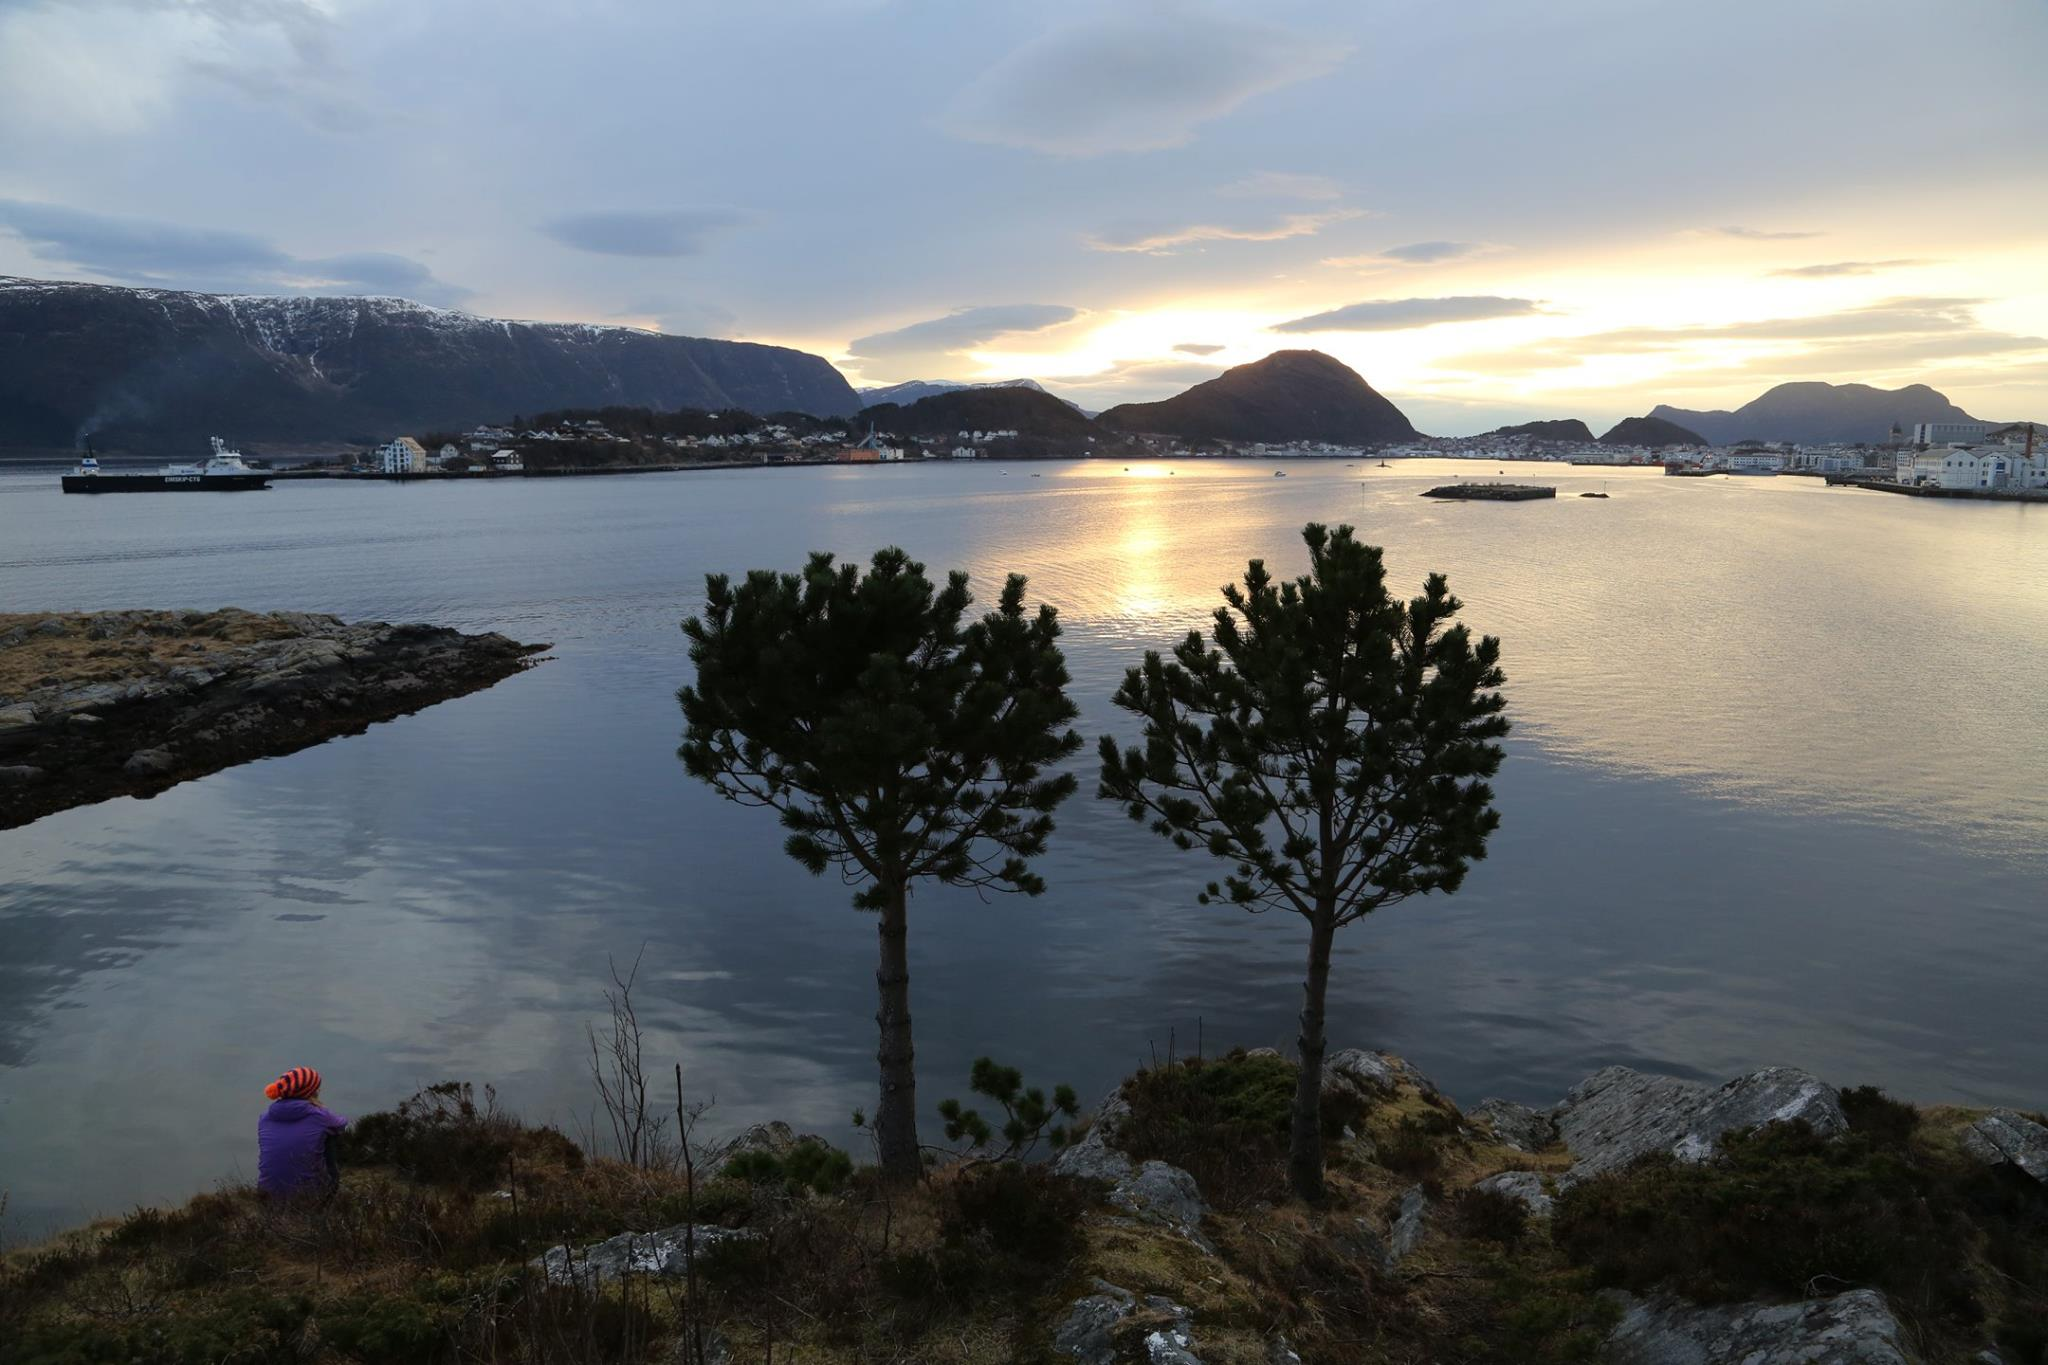 Solnedgang i Ålesund. Foto Odd Roar Lange